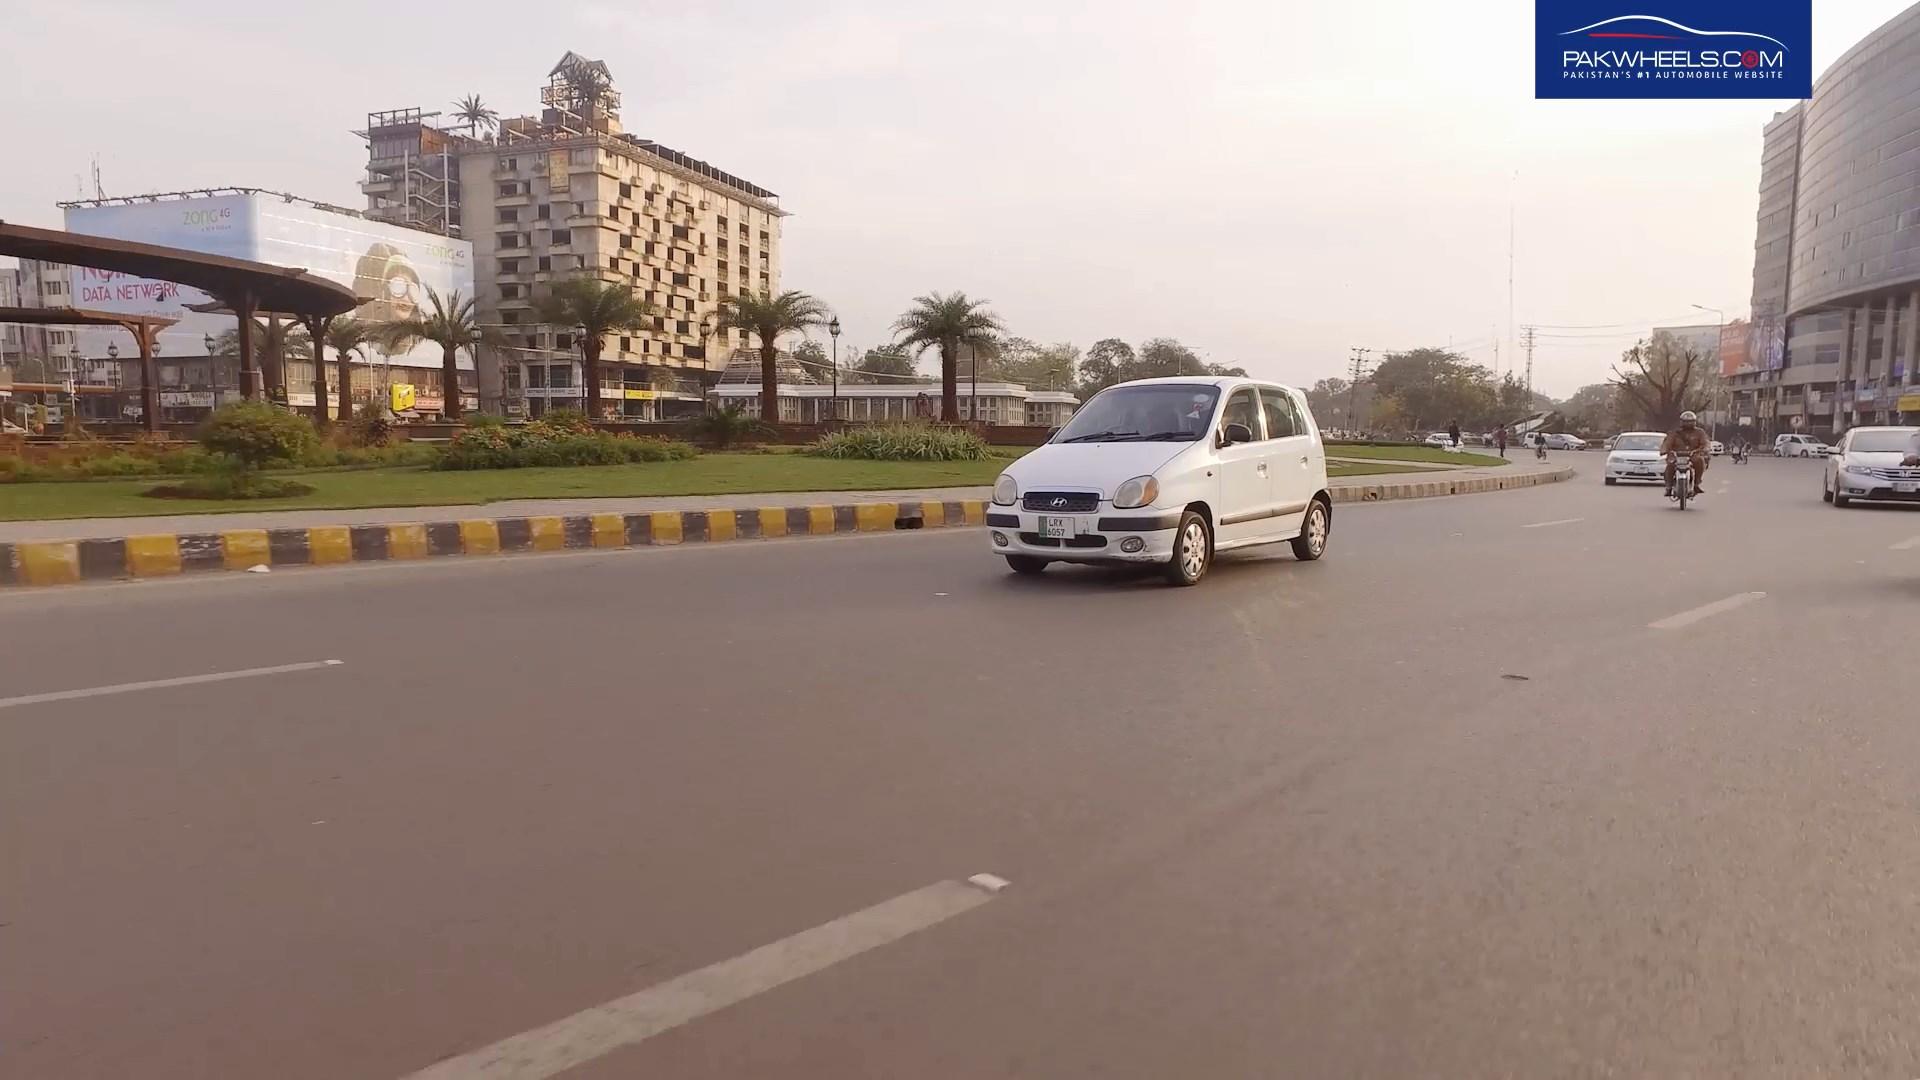 Hyundai Santro 2004 - PakWheels Budget Car Review (13)